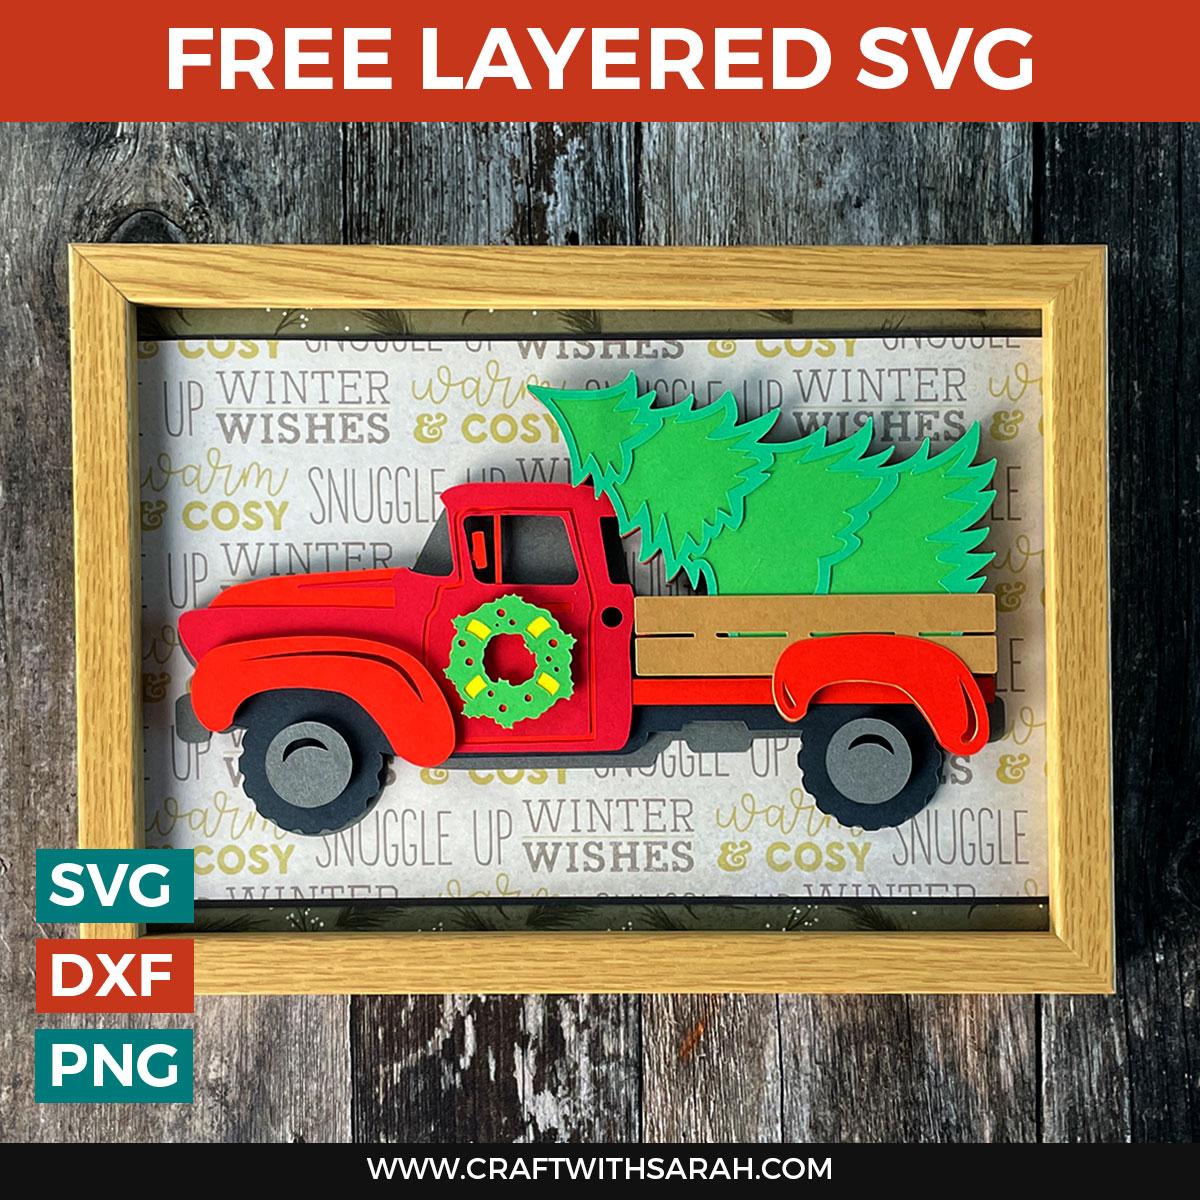 Make a Festive Christmas Truck Craft   Easy Layered Christmas SVG